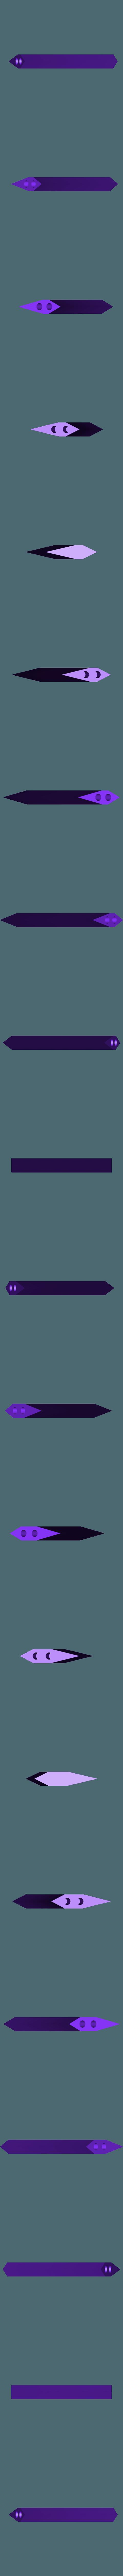 cimeterre_02.stl Download free STL file Cosplay Machete • 3D printable object, Valelab3D